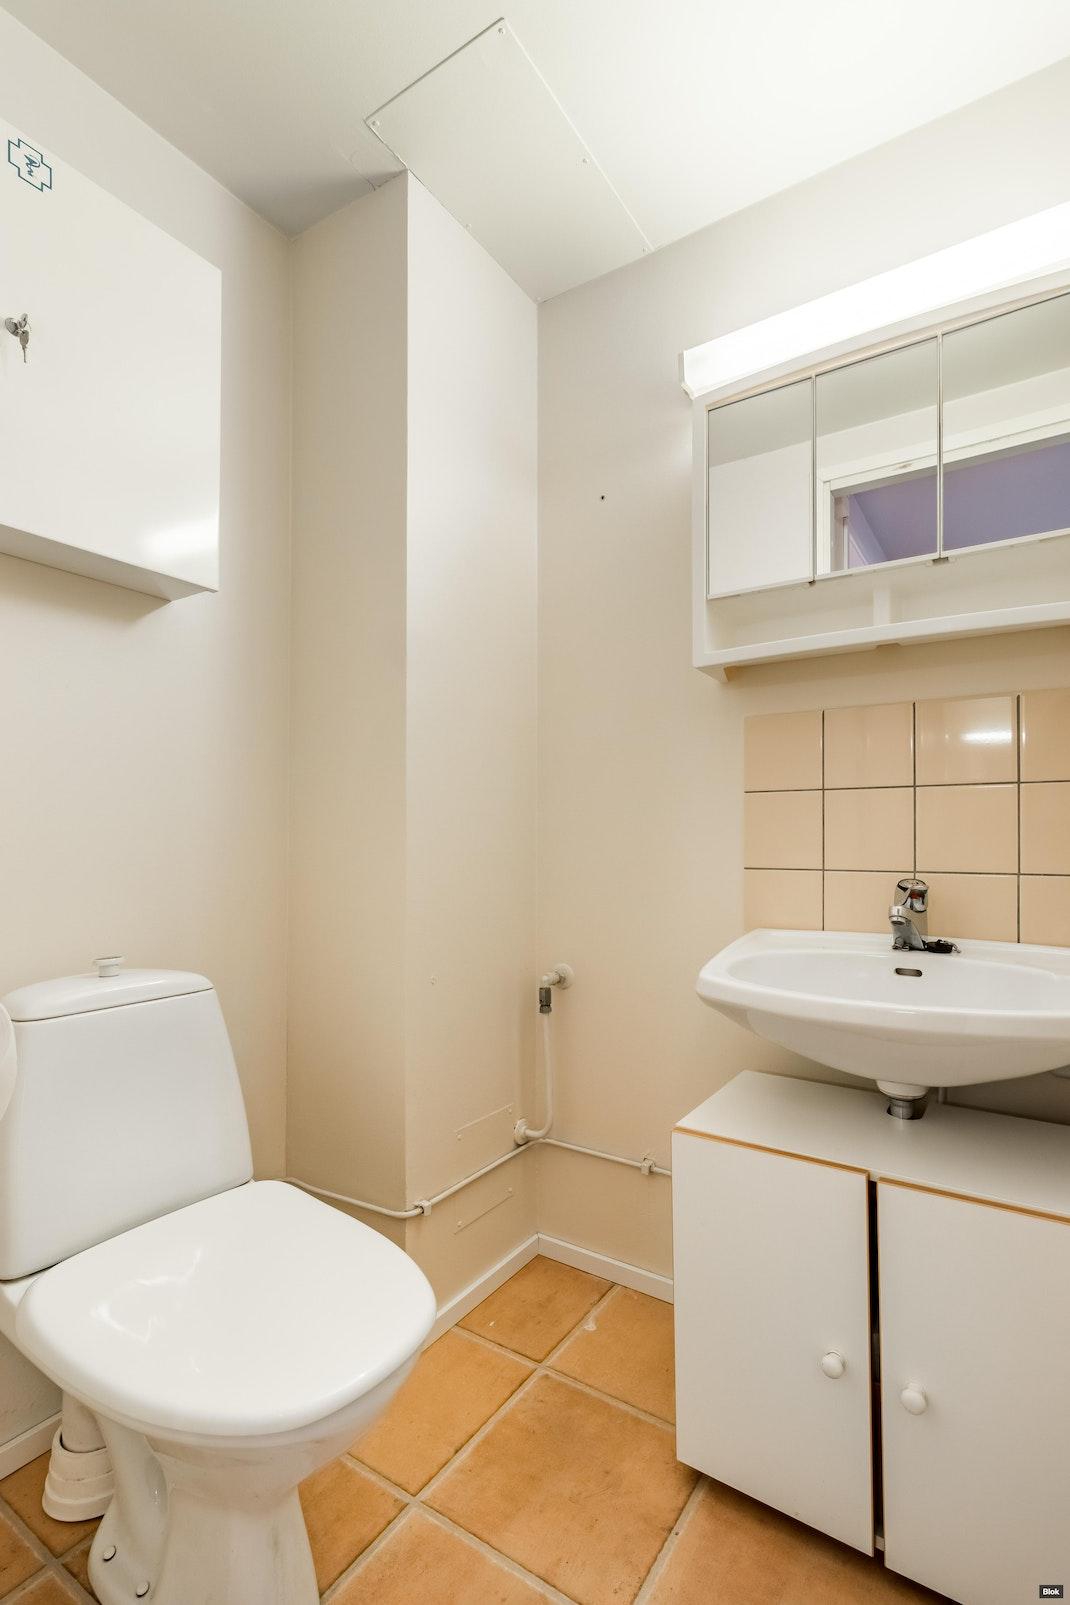 Nevatie 14 A 3 Kylpyhuone & Sauna & Erillinen WC